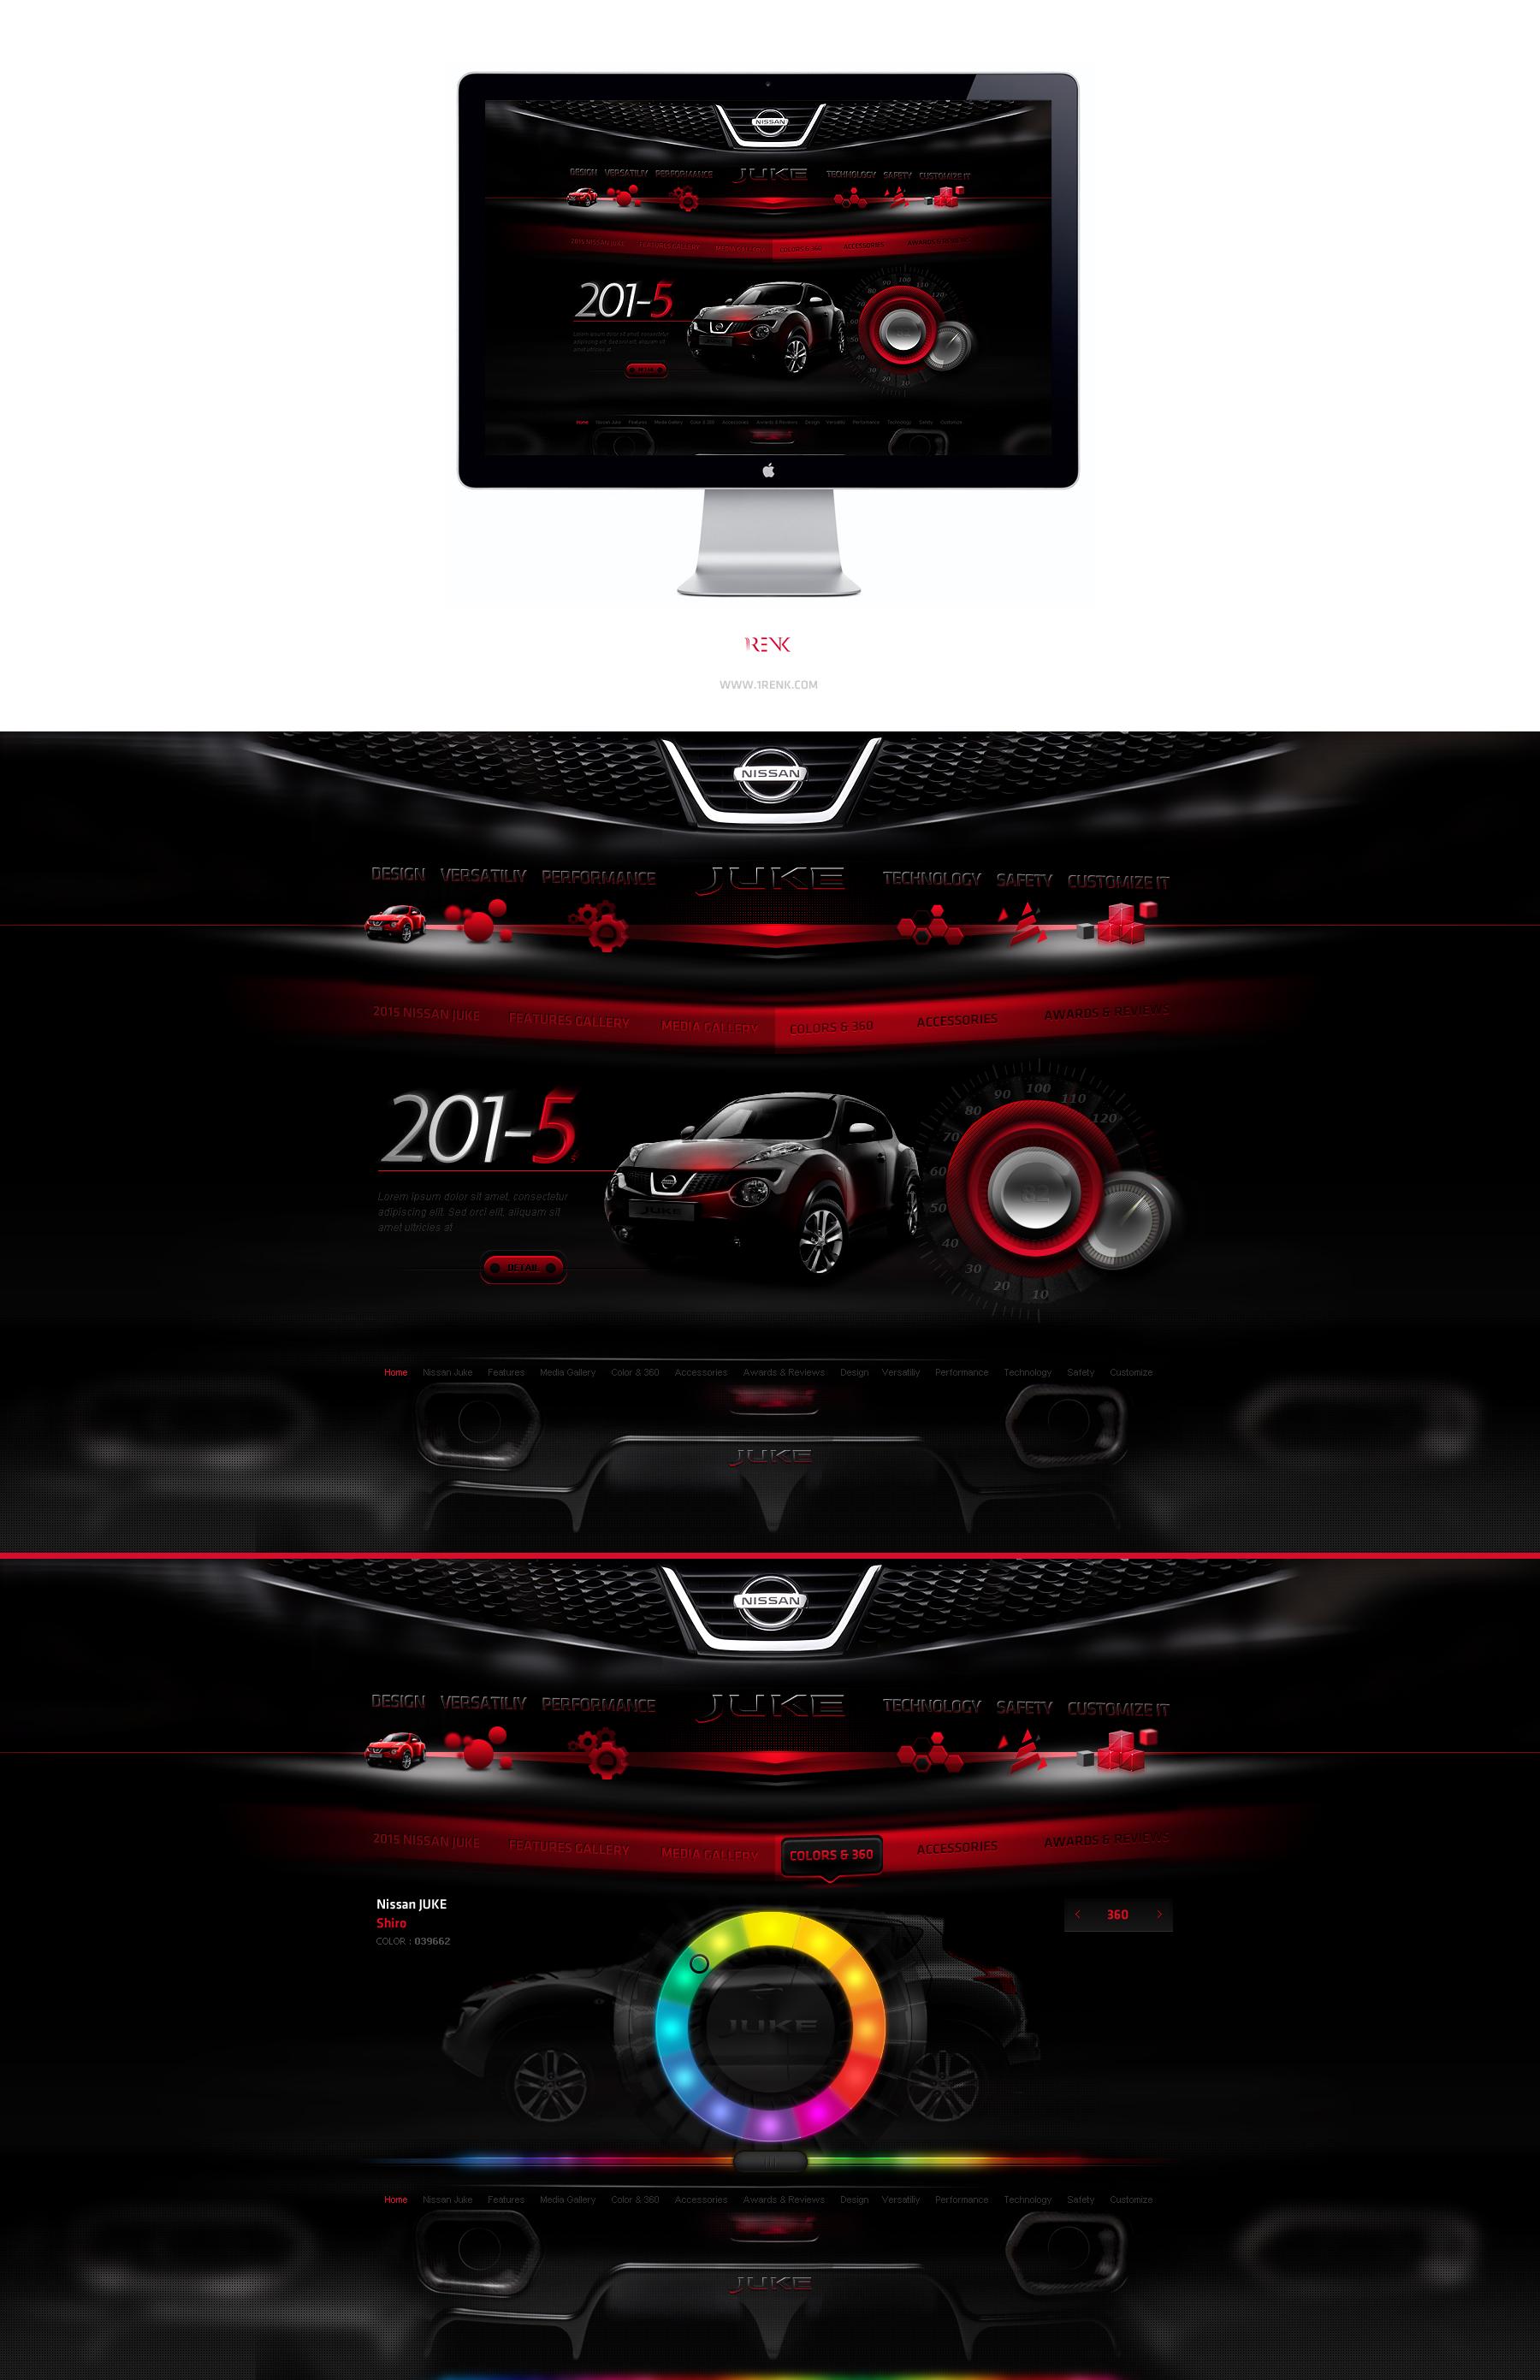 Nissan Juke 201-5s by trcakir